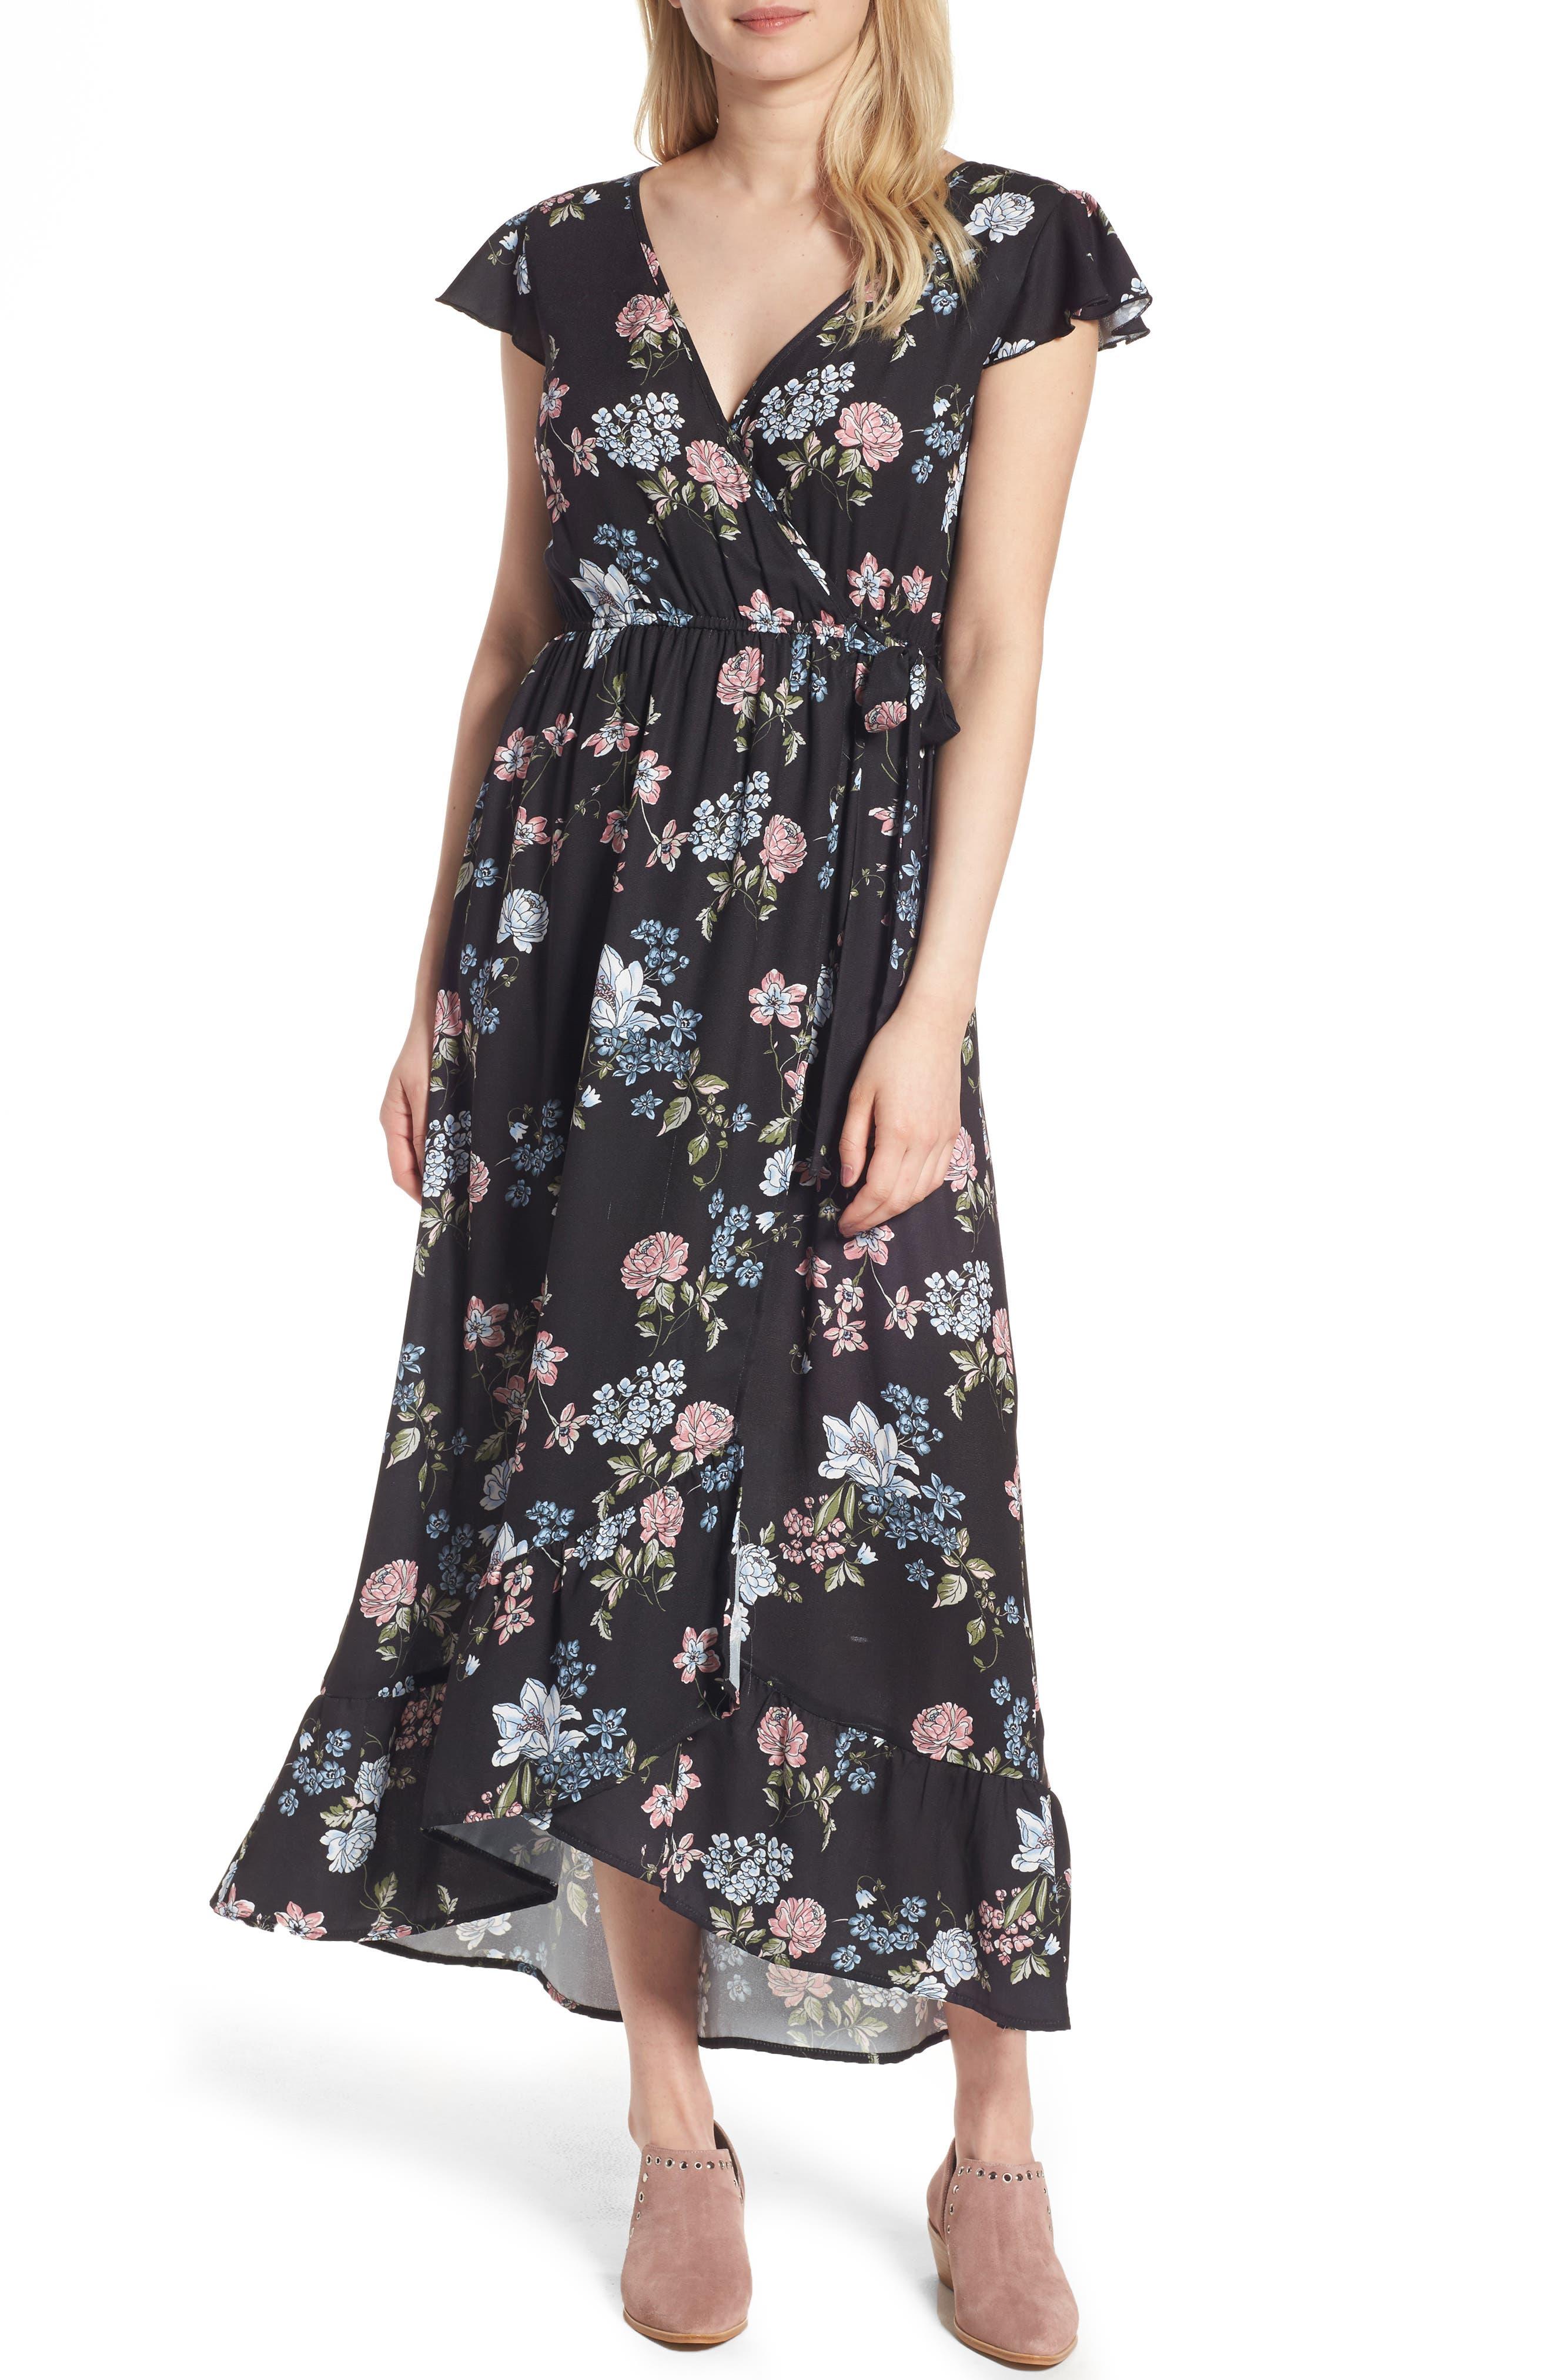 BAND OF GYPSIES, Faux Wrap Maxi Dress, Main thumbnail 1, color, 004